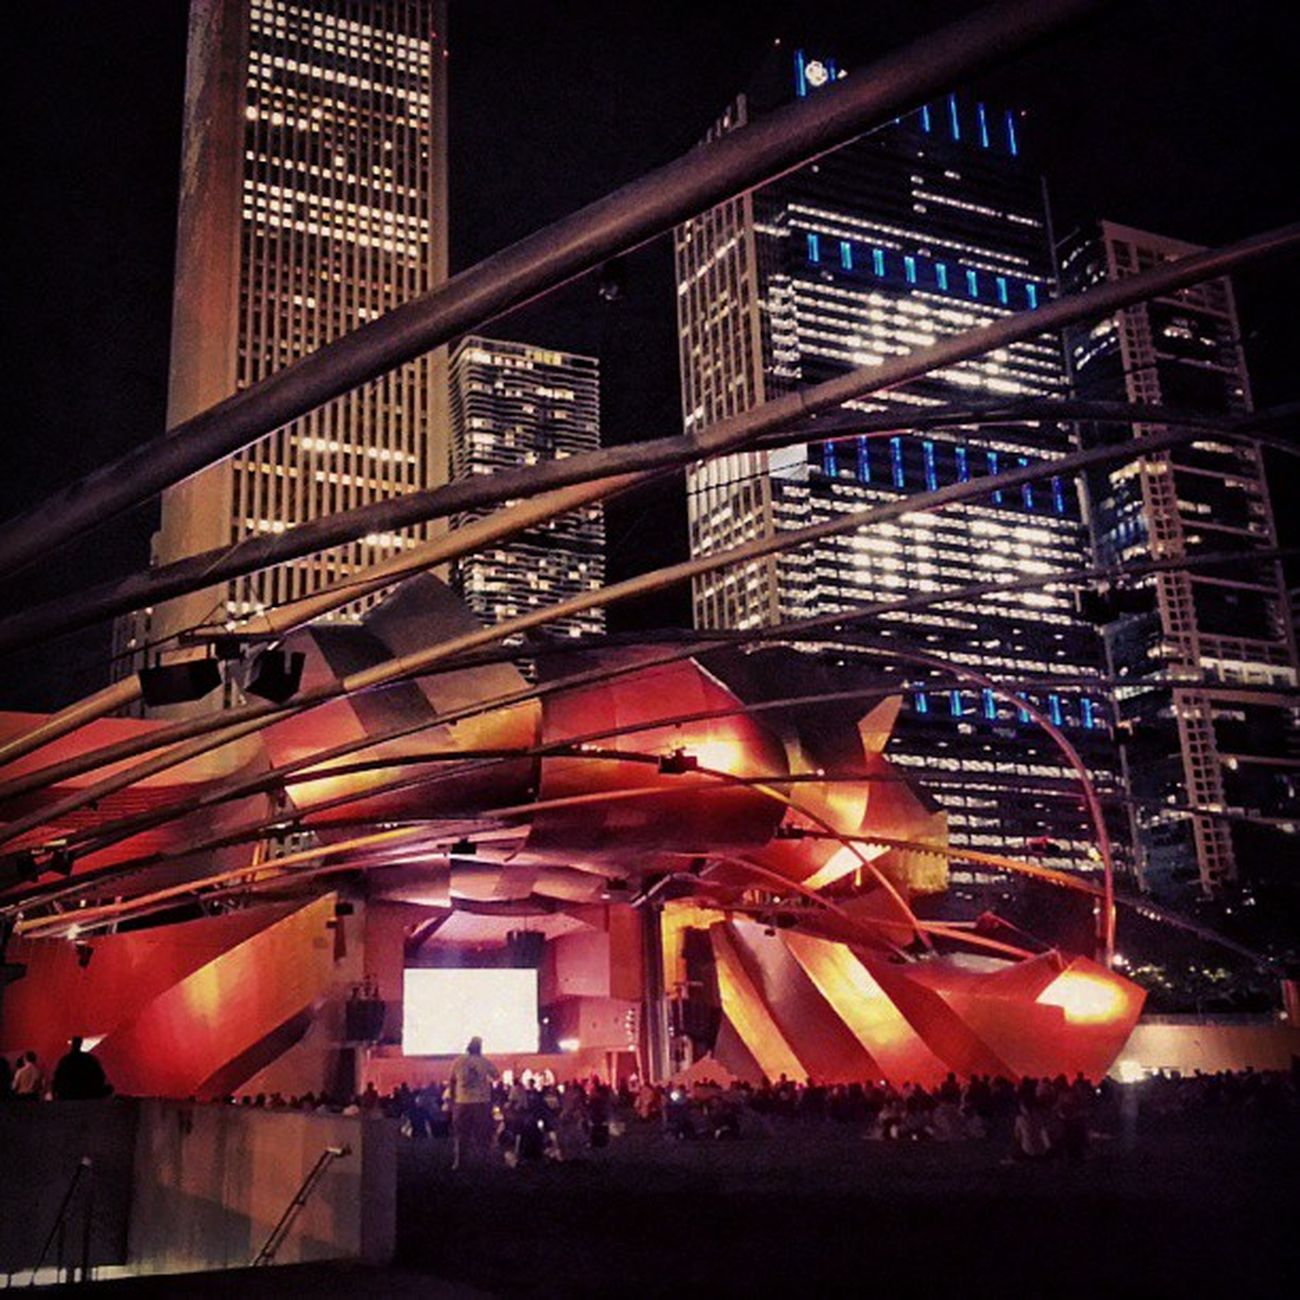 Opening day Chicagojazzfest